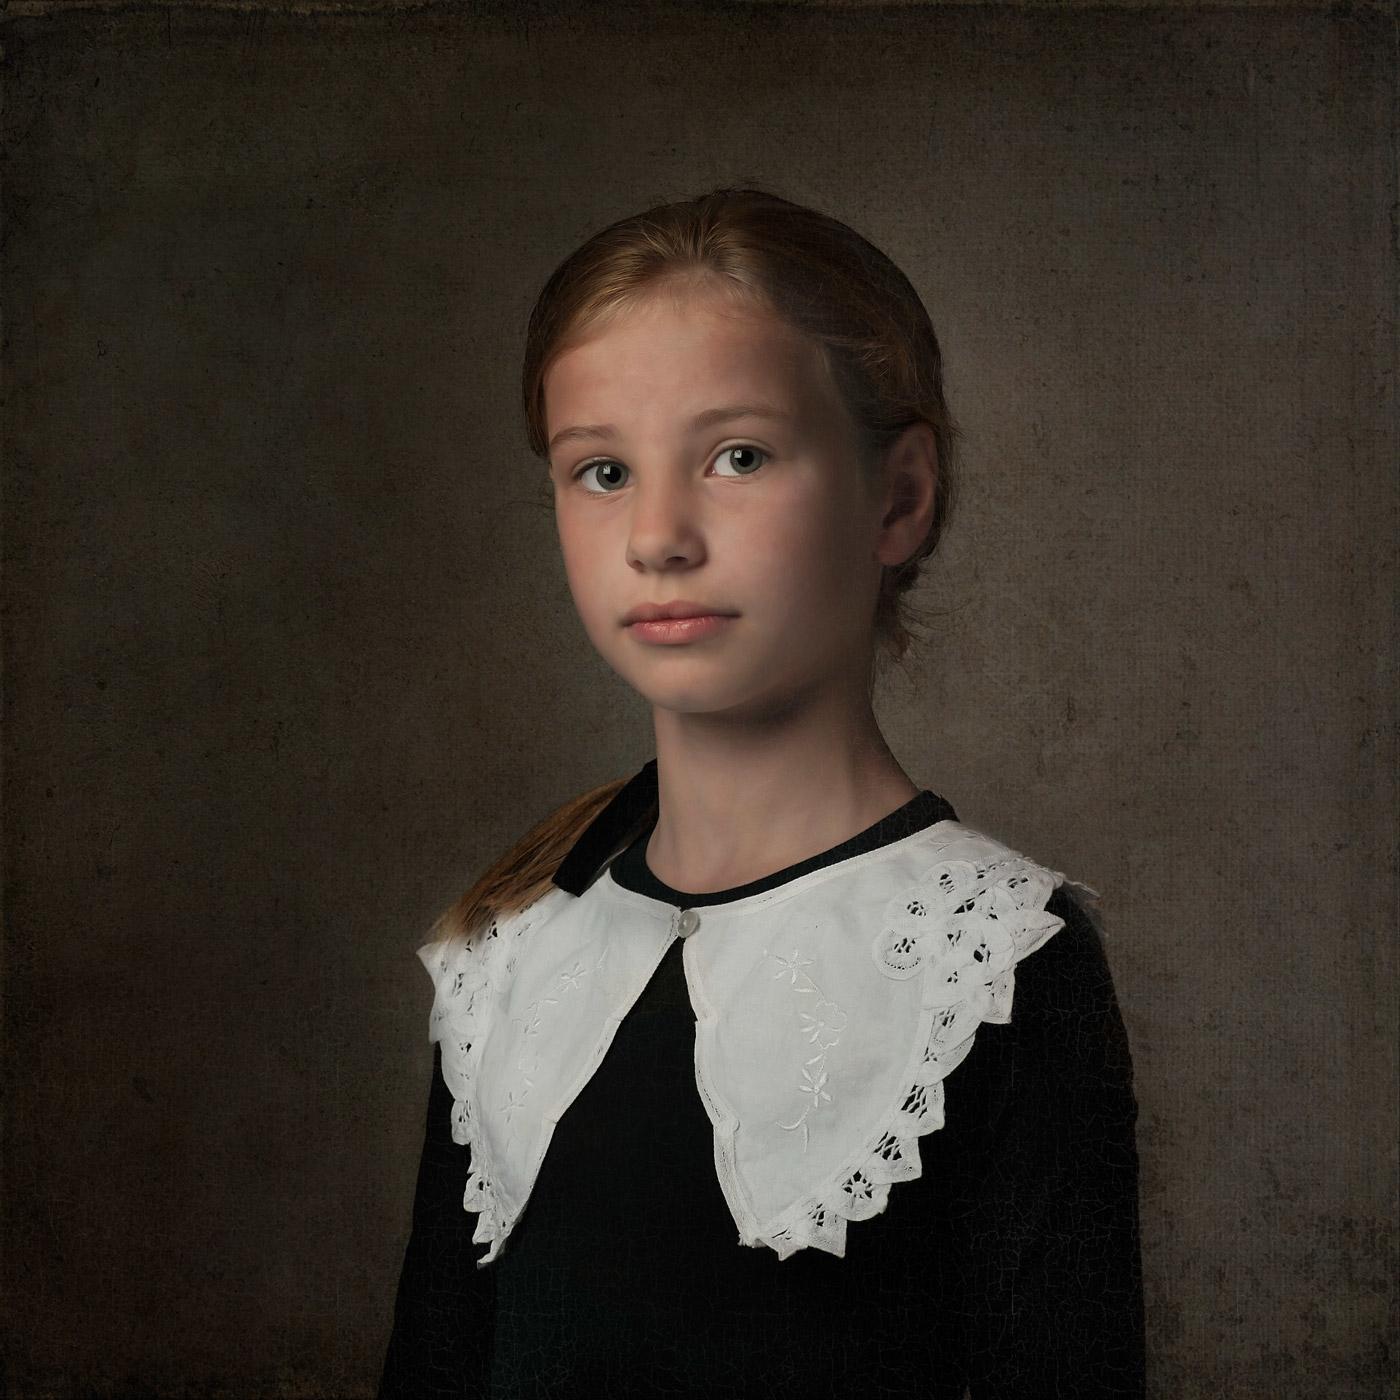 Agnethe - photography, portrait - tinekestoffels   ello